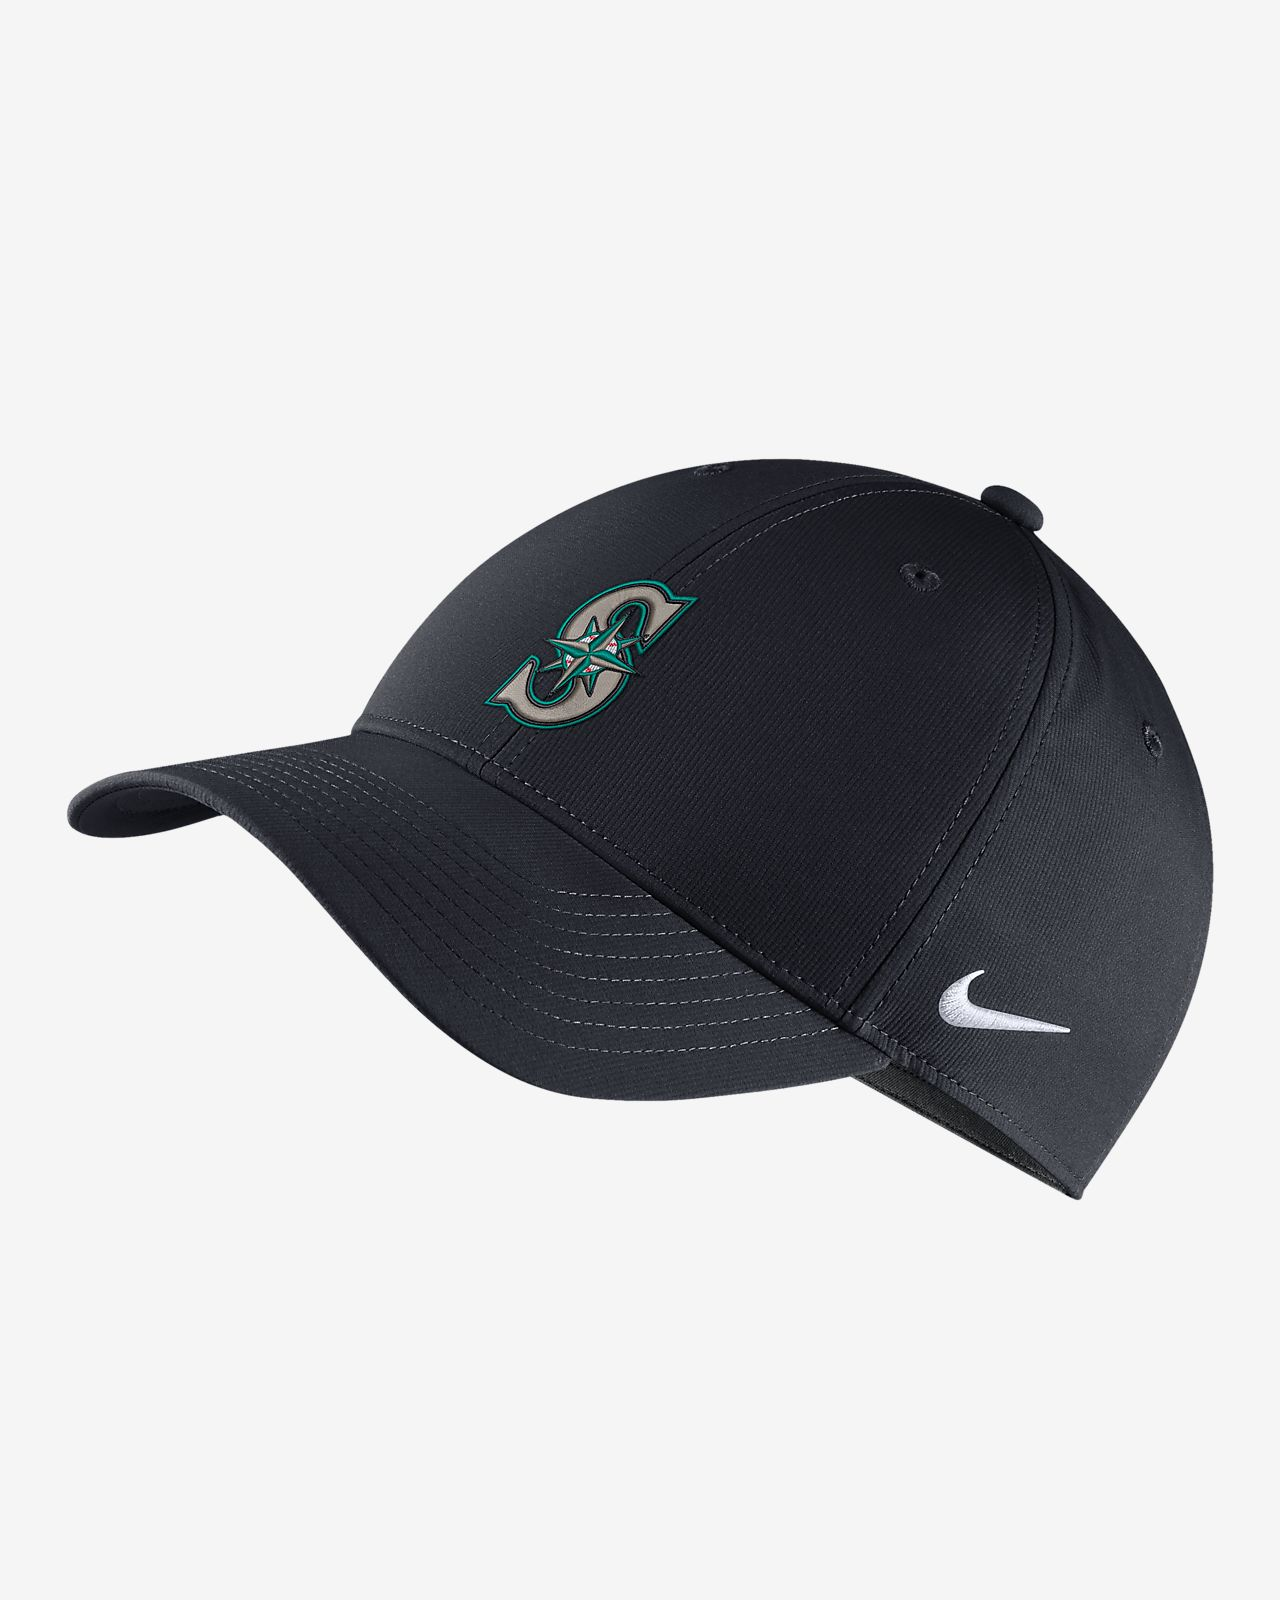 a5fac18043 Nike Dri-FIT Legacy91 (MLB Mariners) Hat. Nike.com